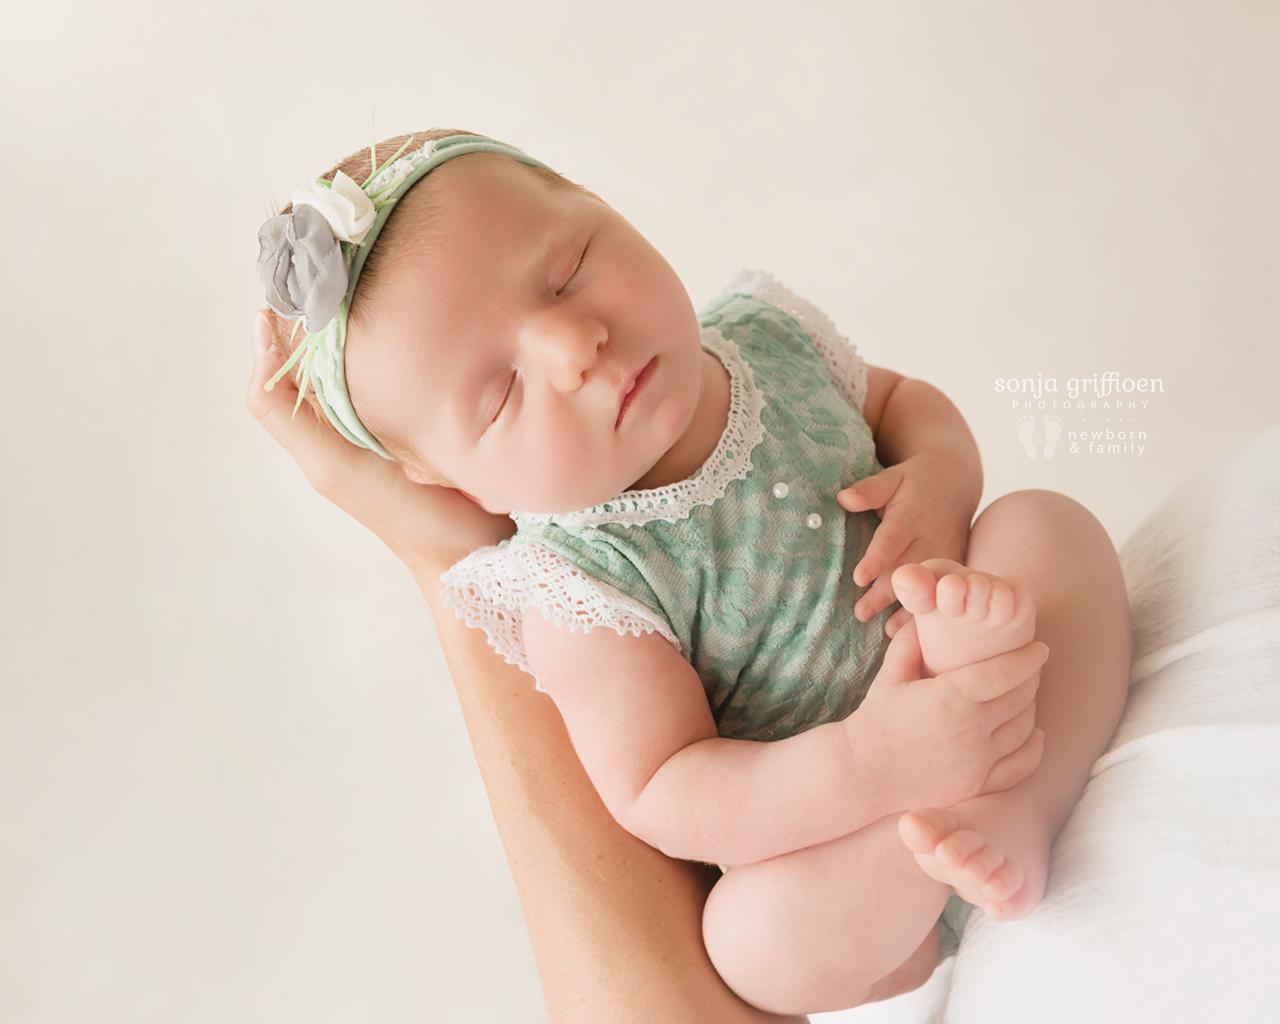 Olivia-A-Newborn-Brisbane-Newborn-Photographer-Sonja-Griffioen-15.jpg